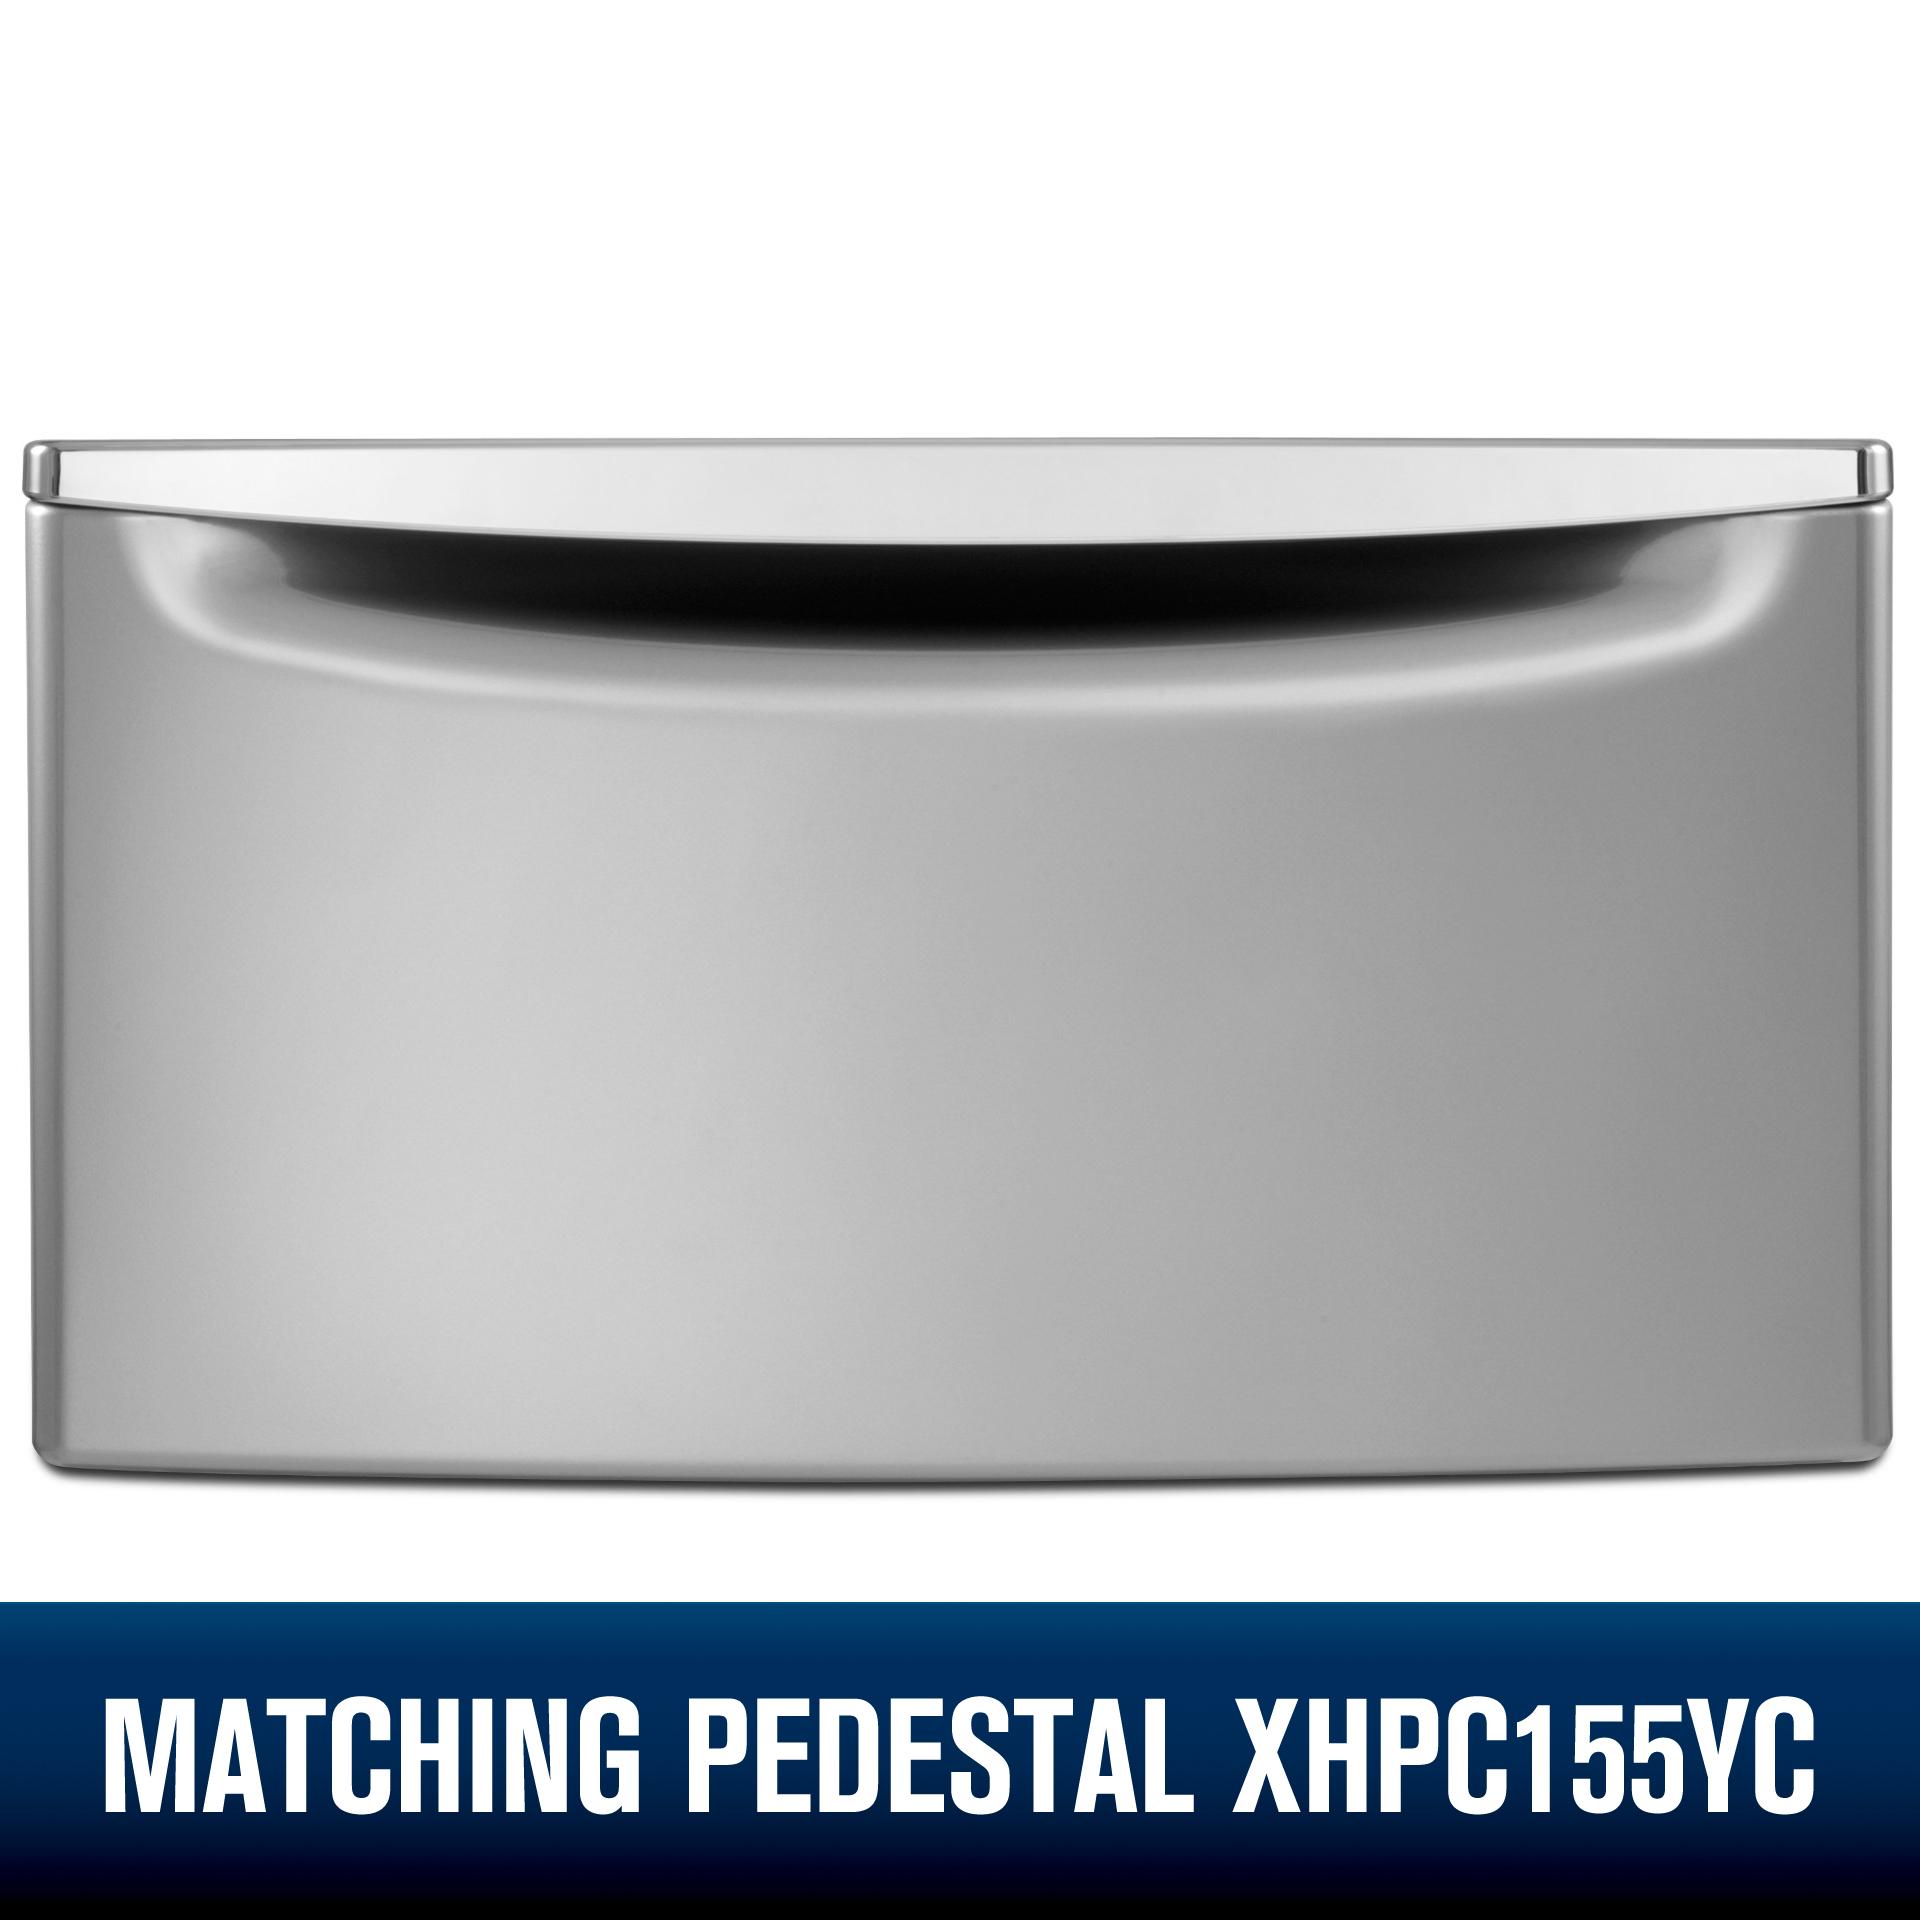 Whirlpool WGD92HEFC 7.4 cu. ft. Gas Dryer w/ Advanced Moisture Sensing - Chrome Shadow